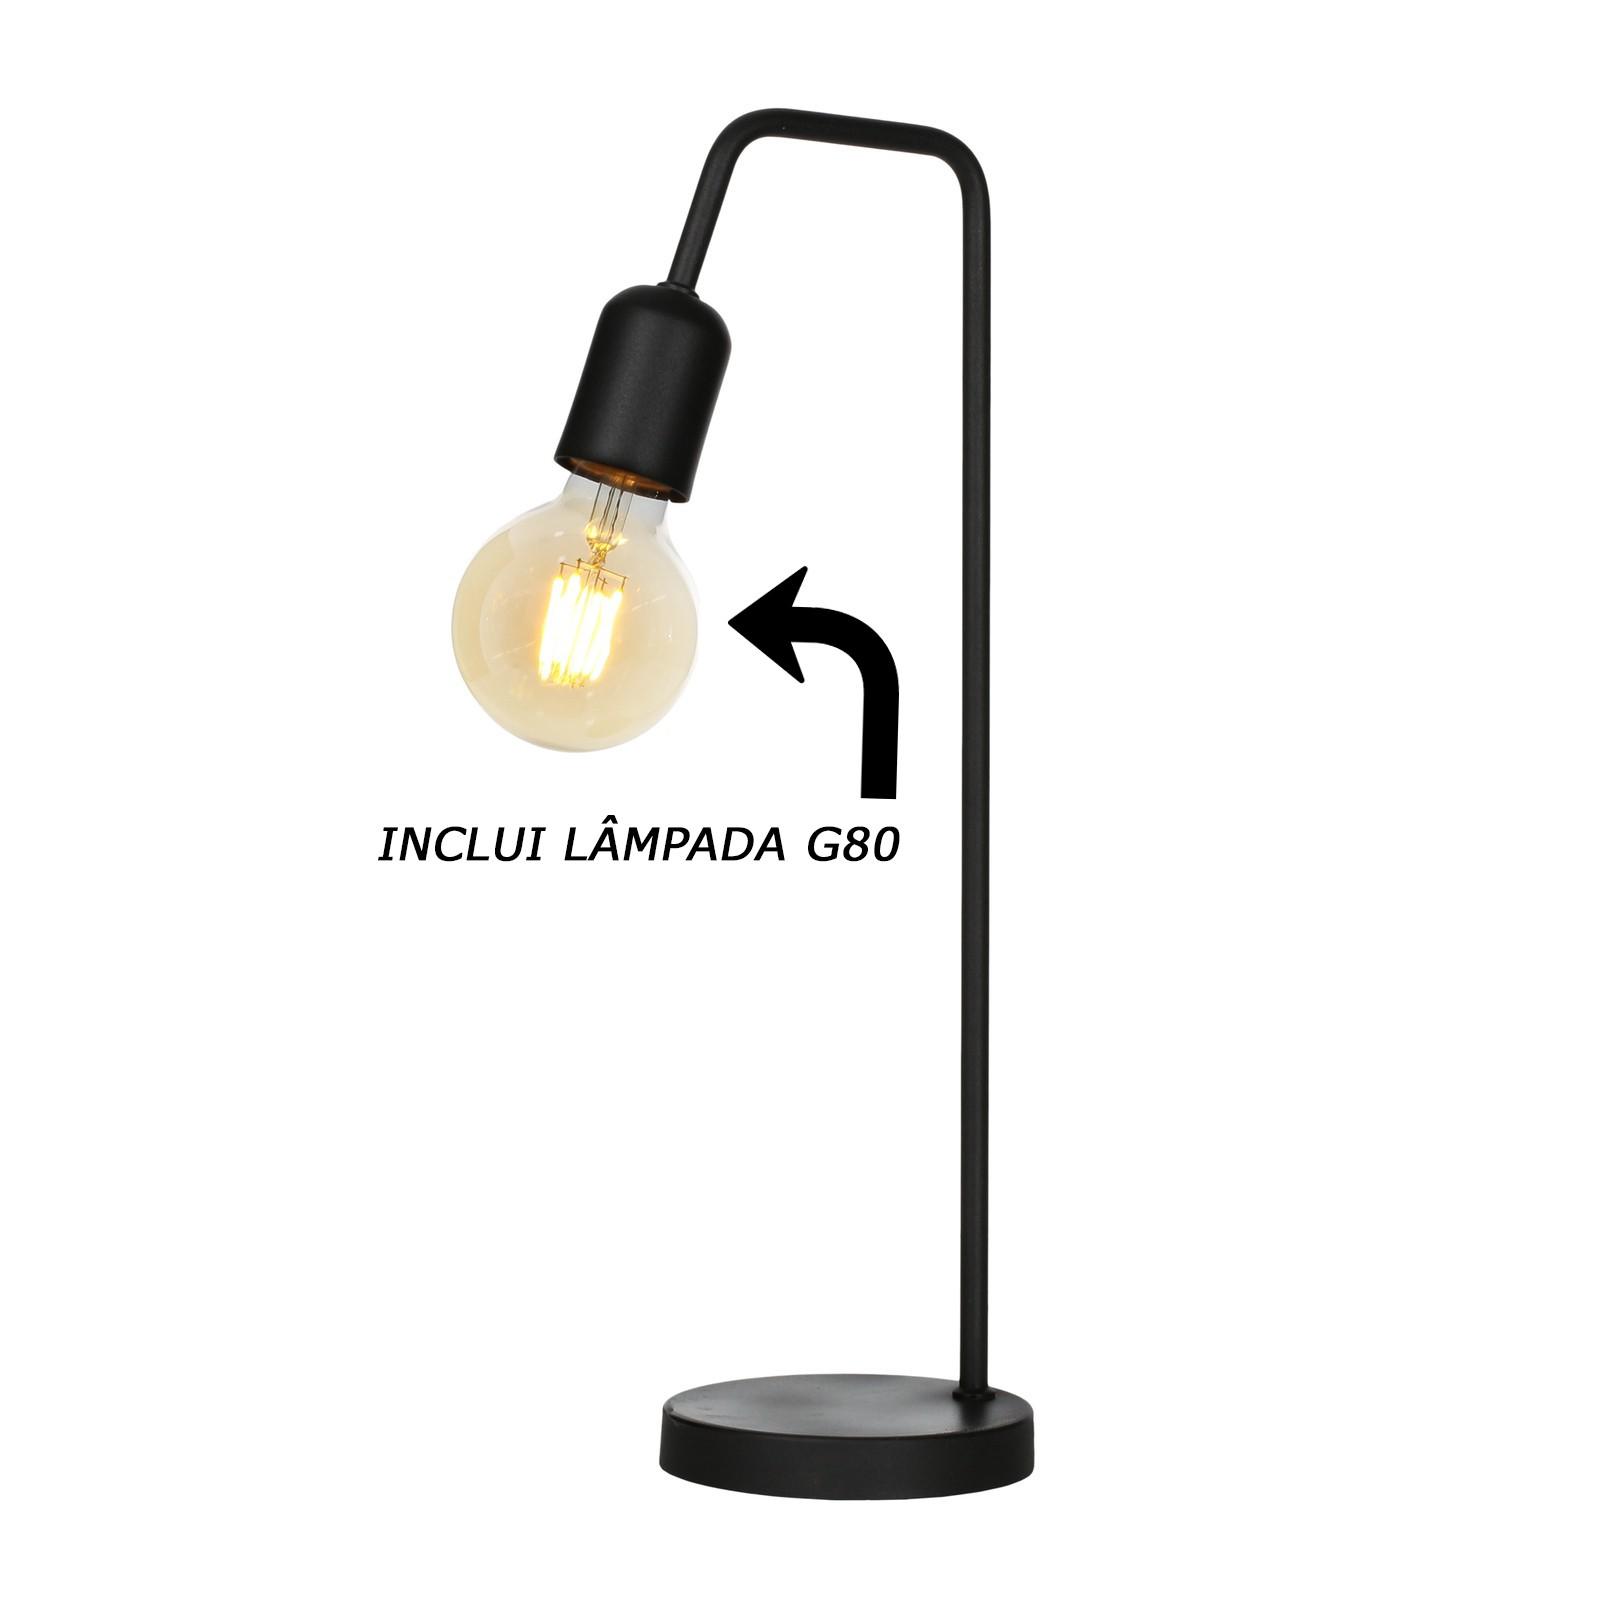 Luminária De Mesa Abajur Retrô Vintage + Lâmpada G80